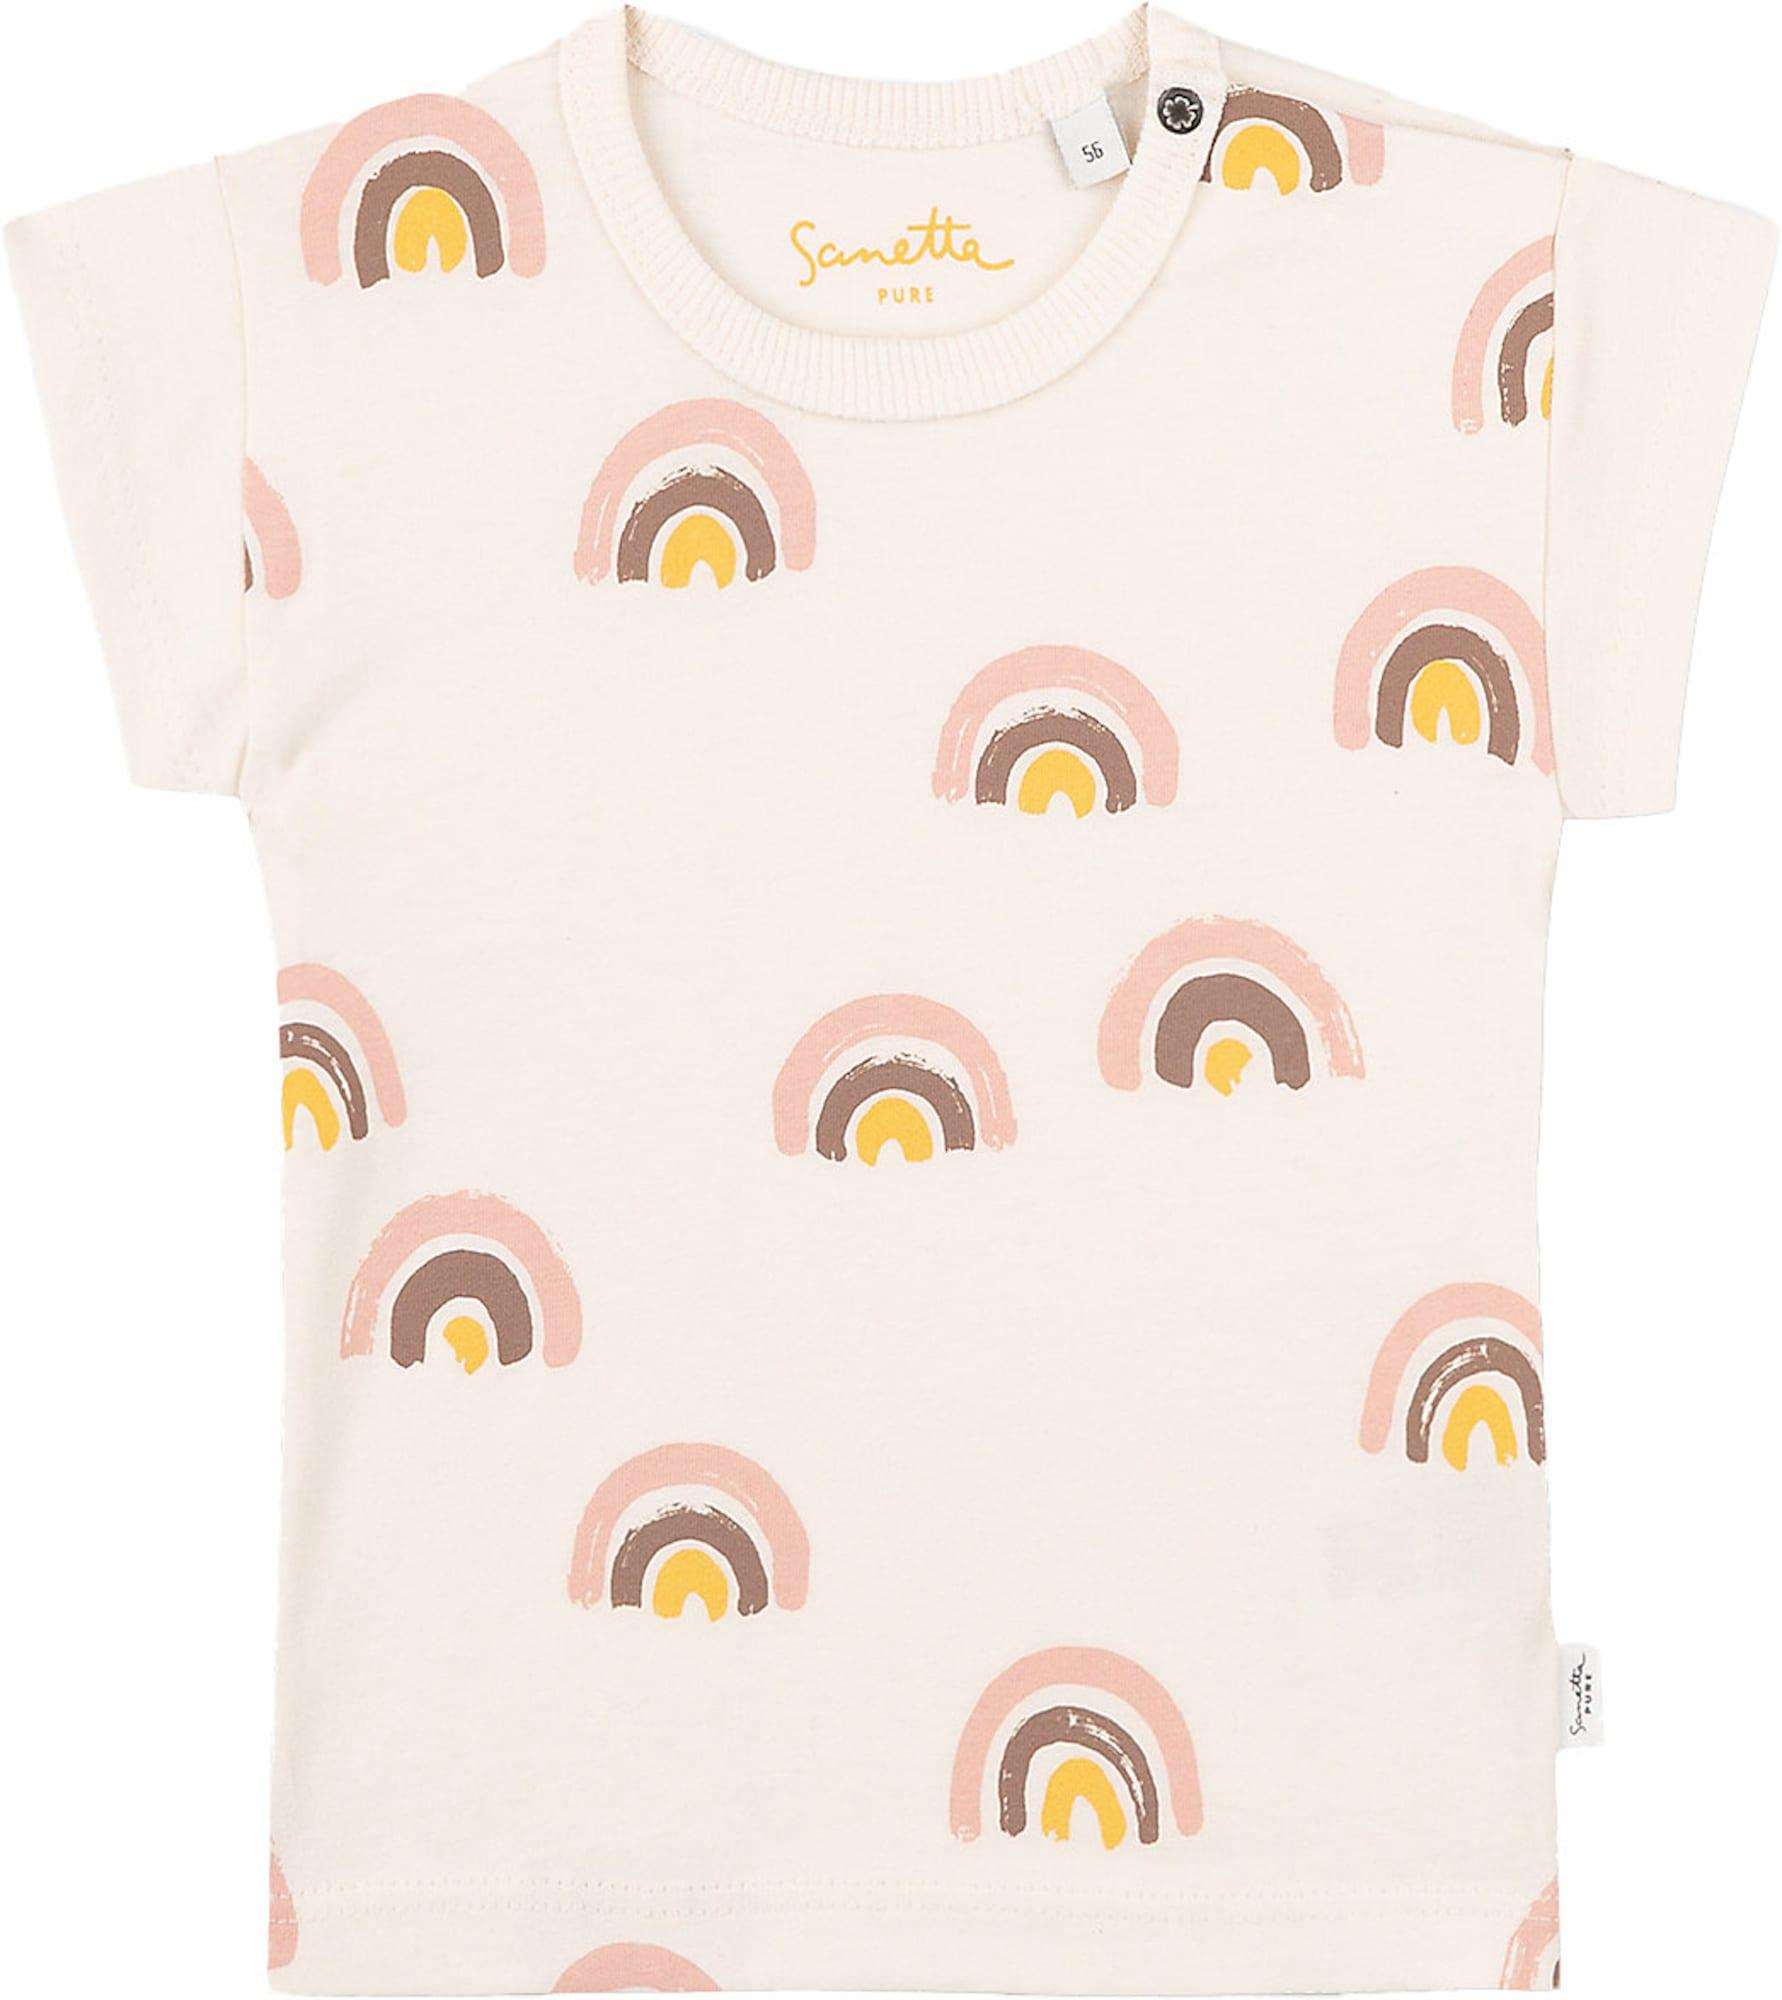 Sanetta Pure Marškinėliai vilnos balta / rožių spalva / aukso geltonumo spalva / ruda